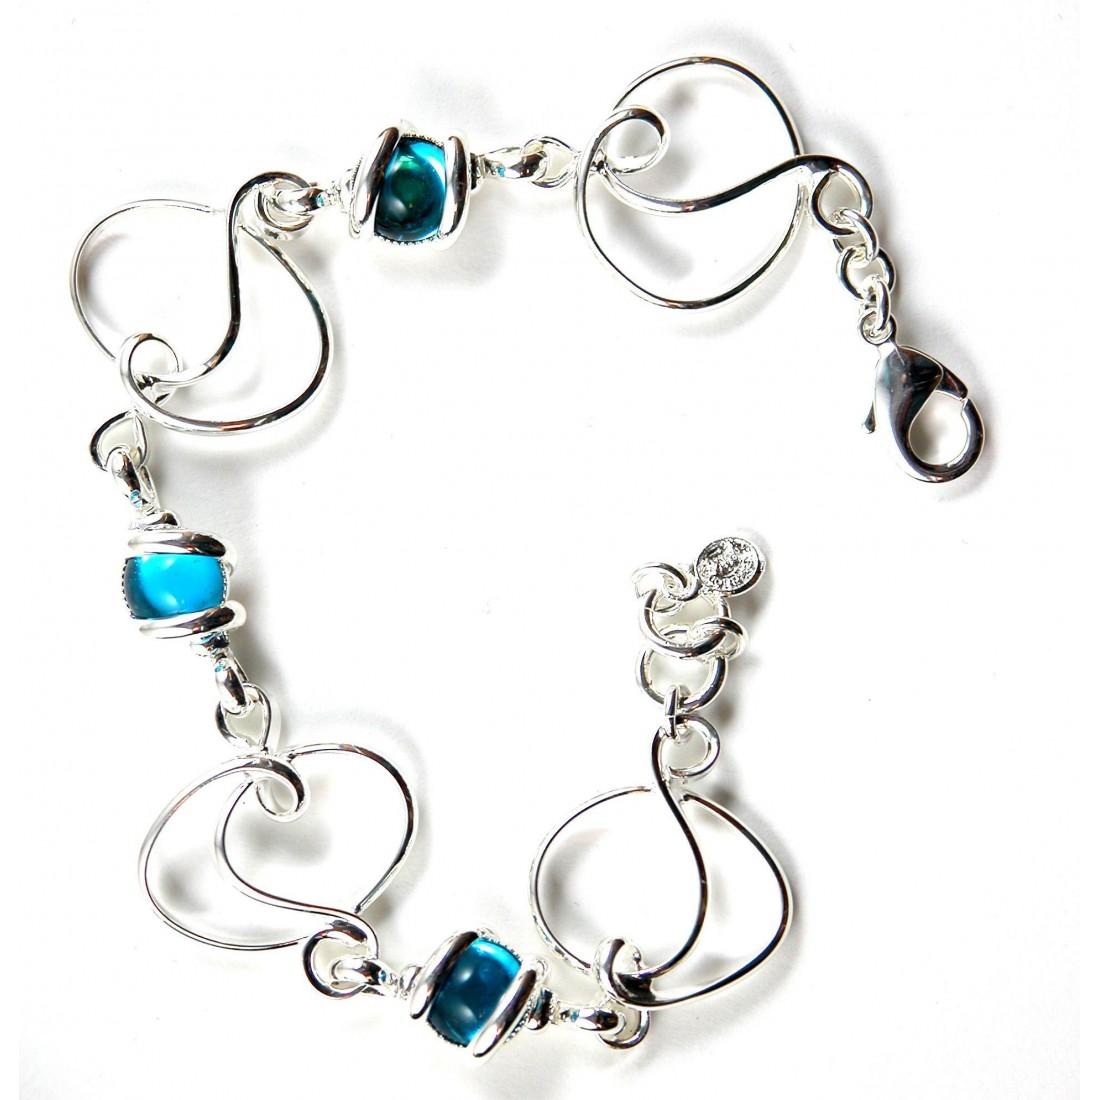 Bracelet artisanal argent et bleu-Atelier PIK